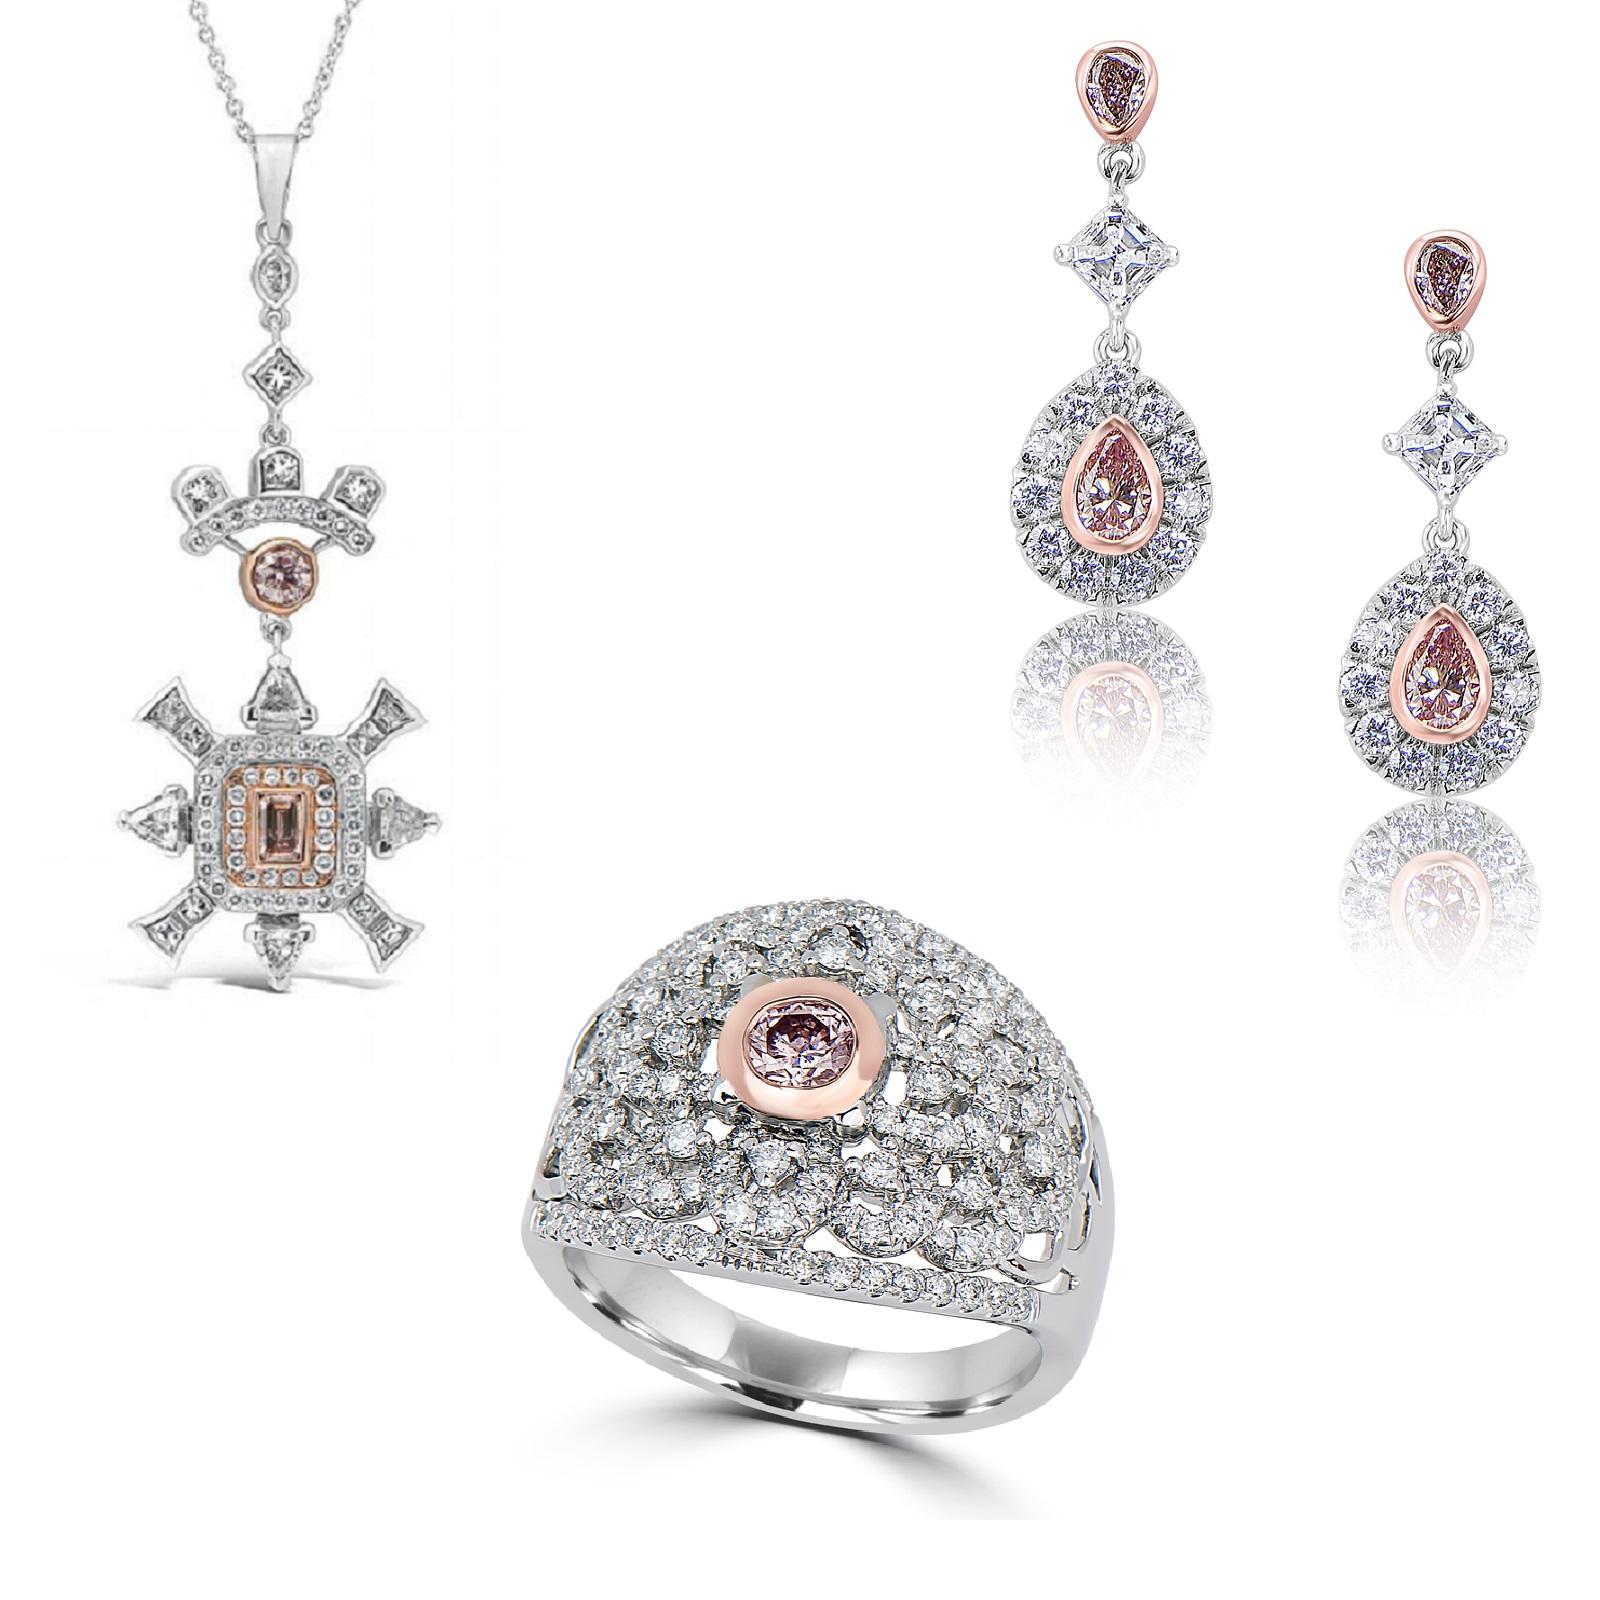 Mixed Argyle Pink Diamonds Ring, Pendant & Earrings Set (4.90ct TW)